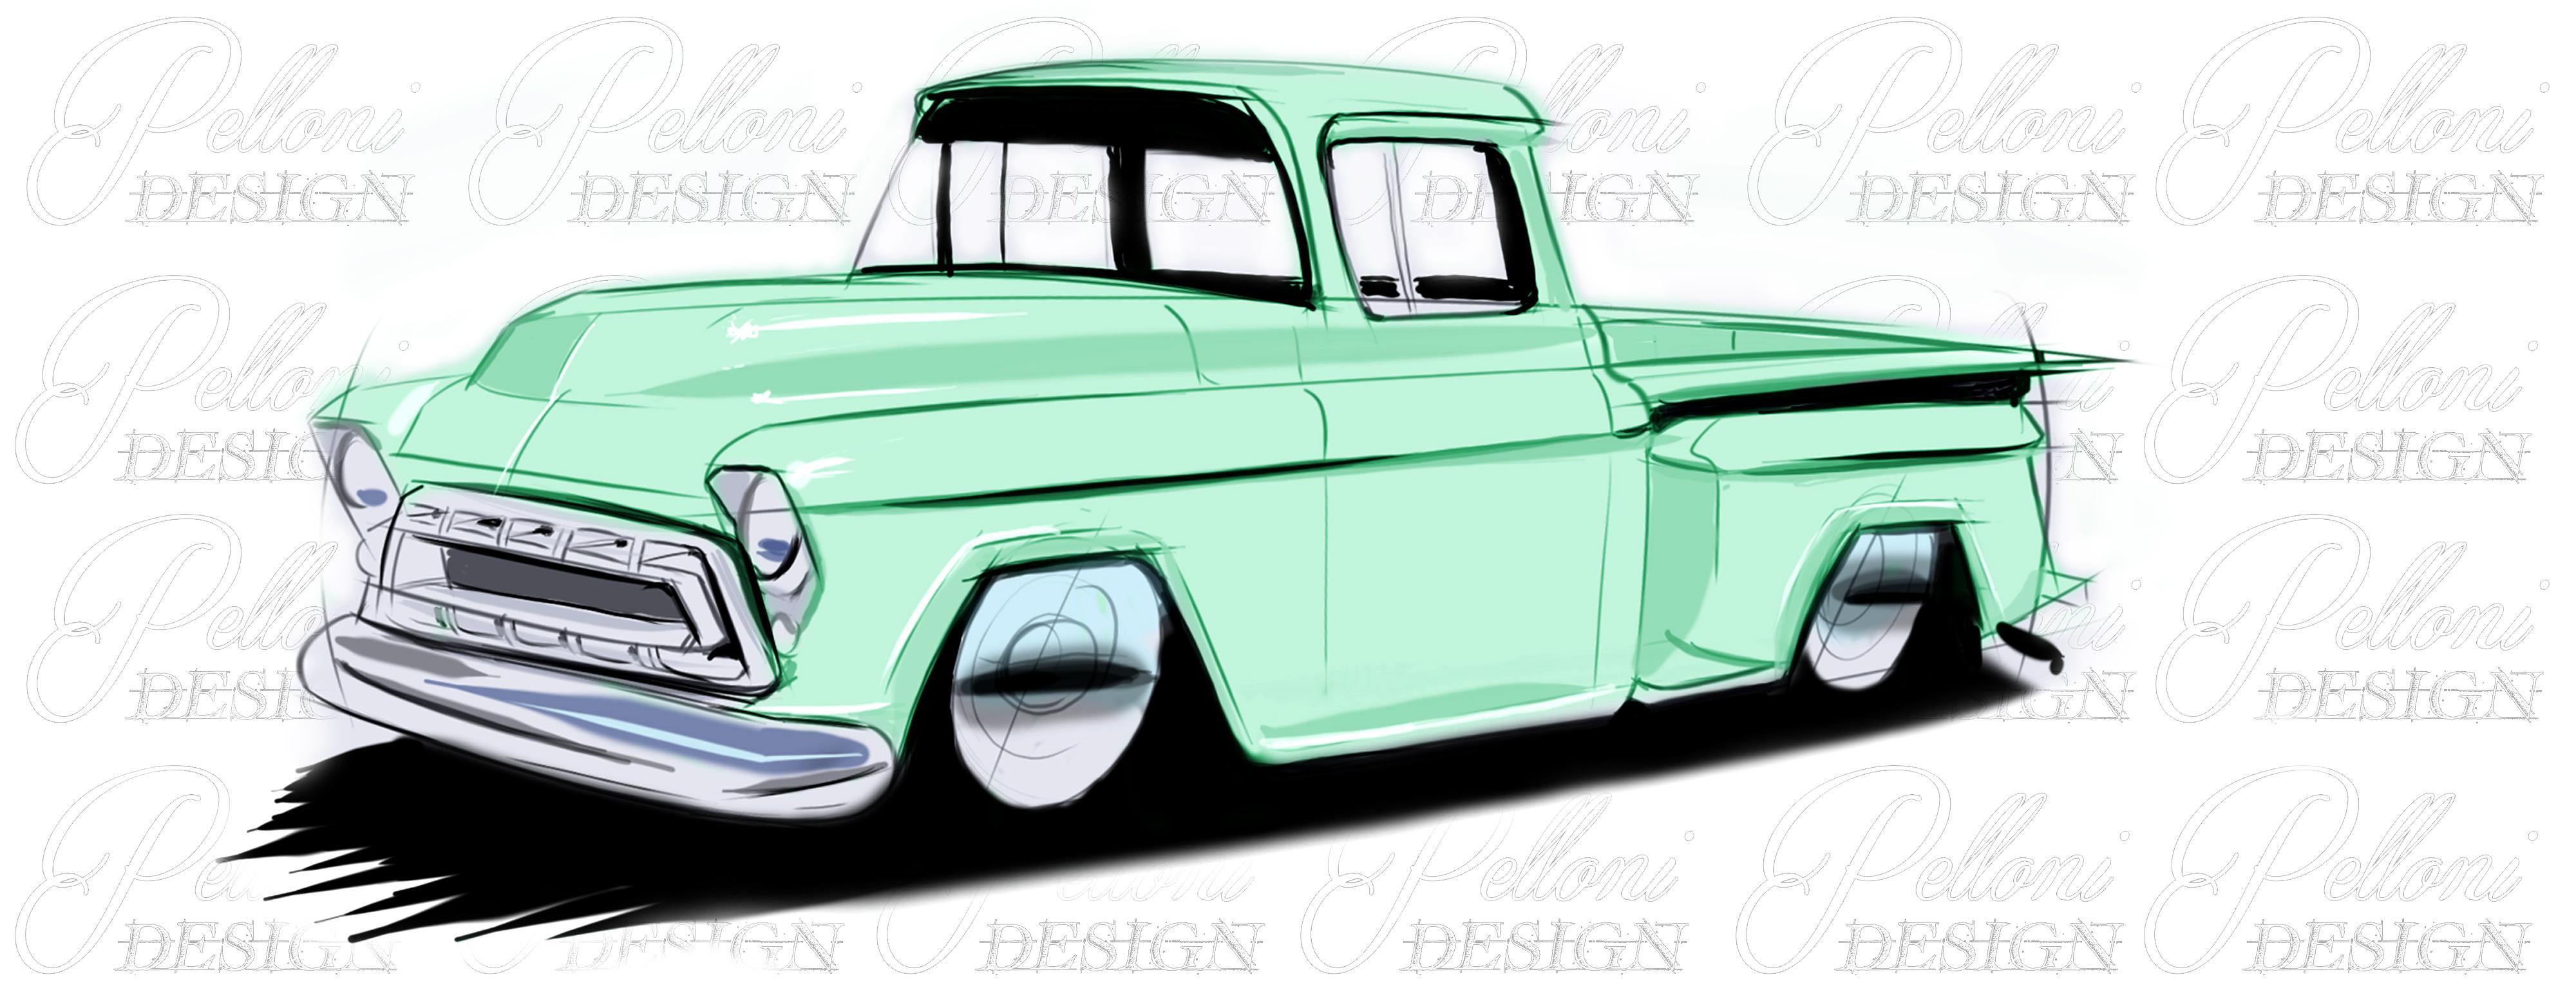 1957 Chevrolet Side Step Truck Hand Drawn Digtal Car Sketch Rendering